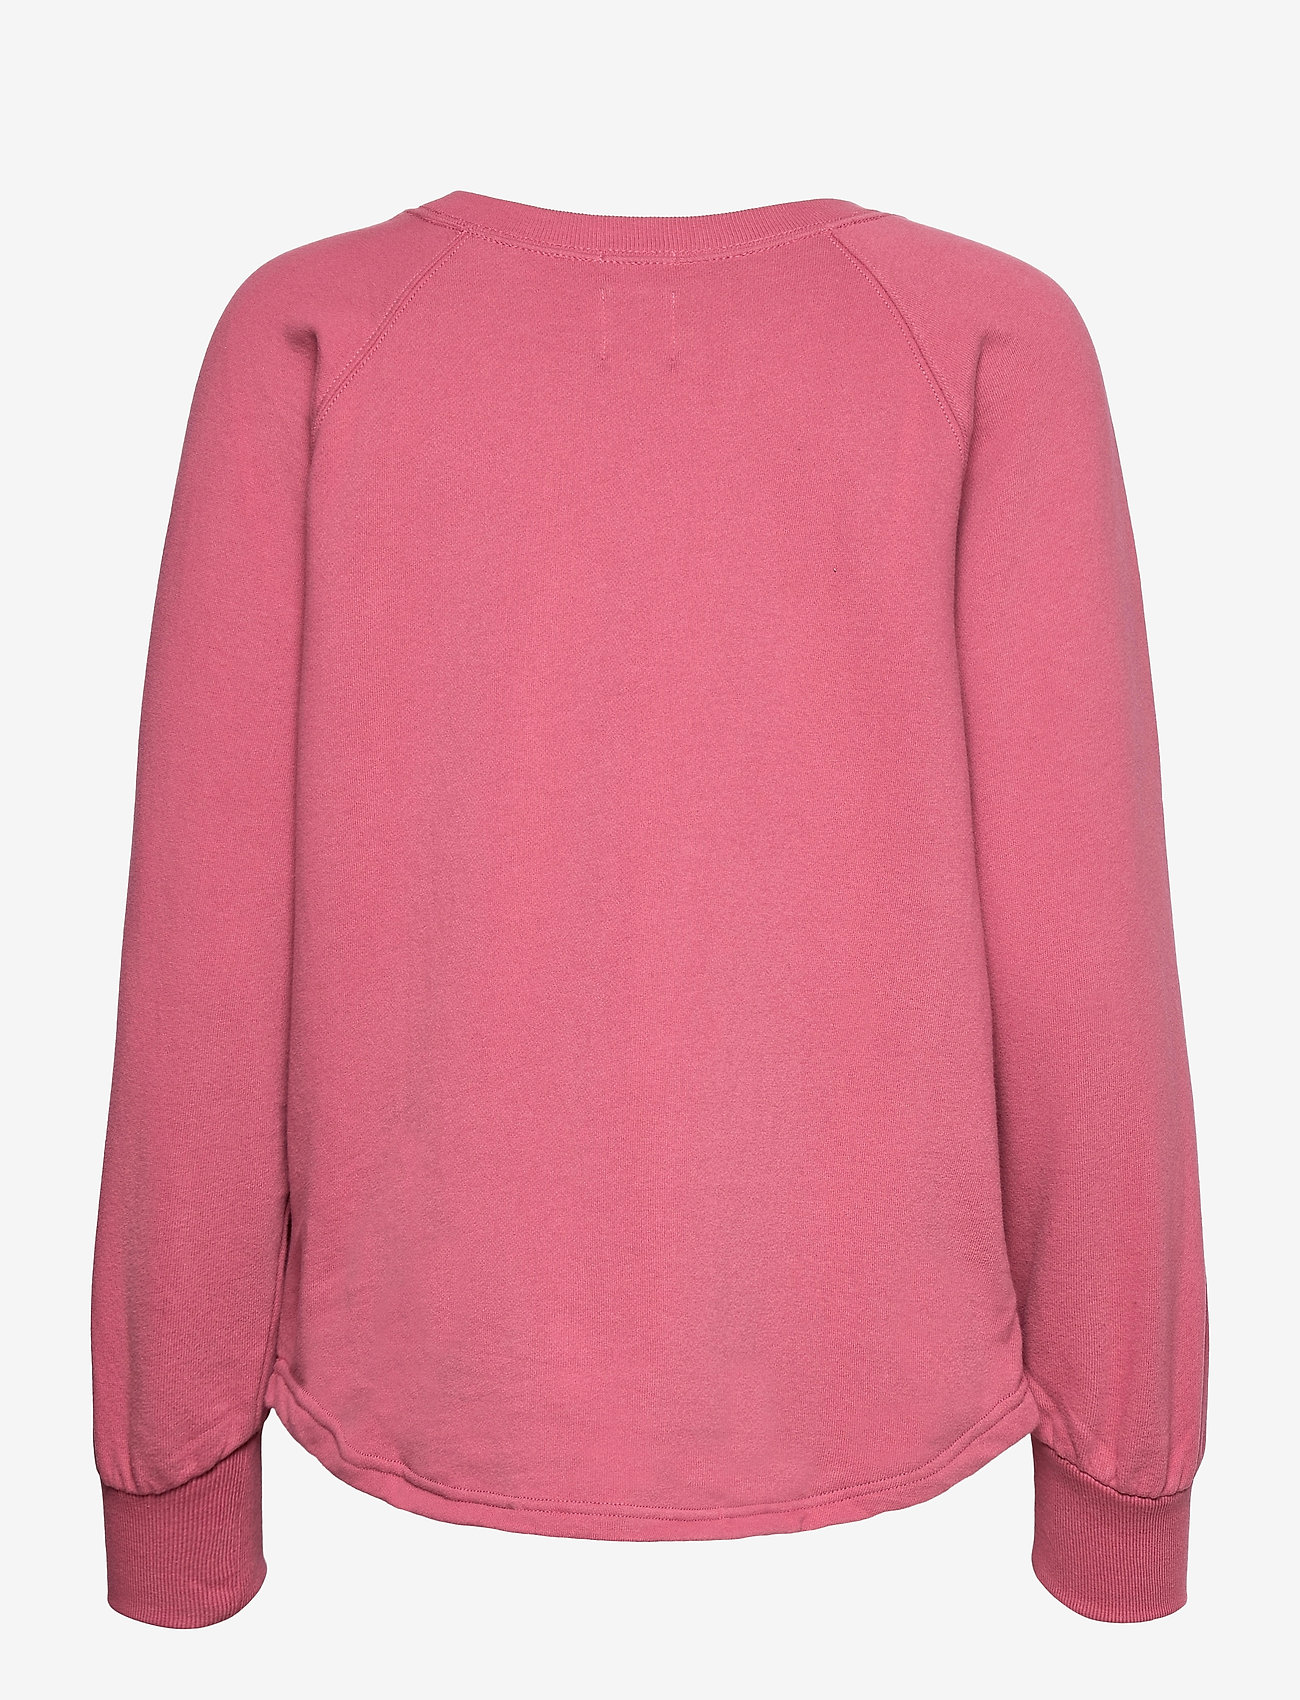 GAP - GAP SHINE TUNIC - sweatshirts - faded rose 559 - 1